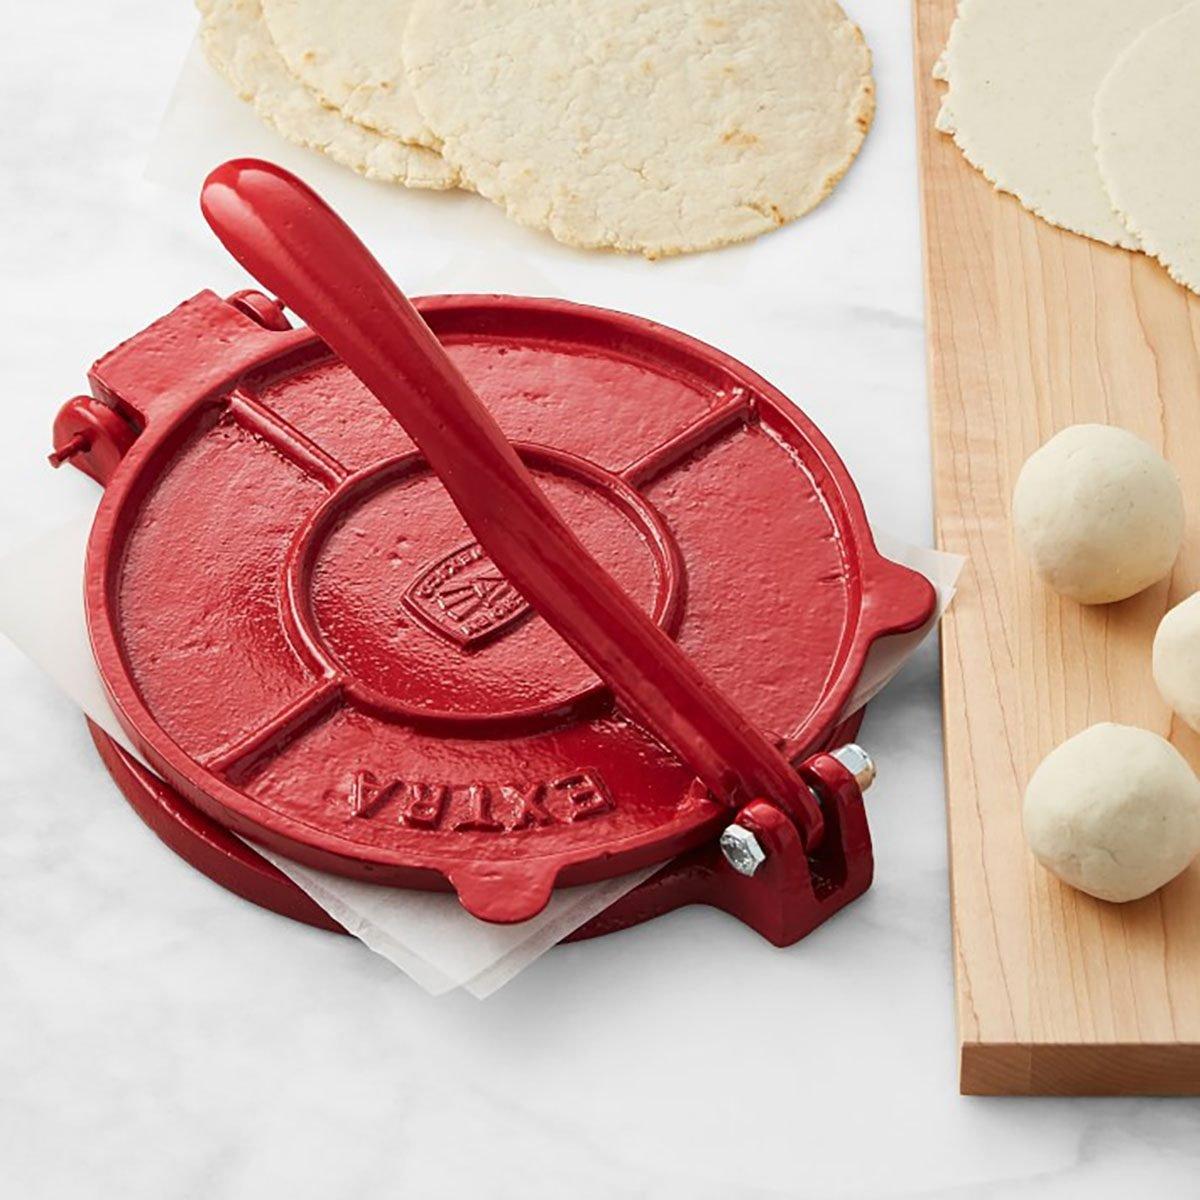 Cast-Iron Tortilla Press, Red